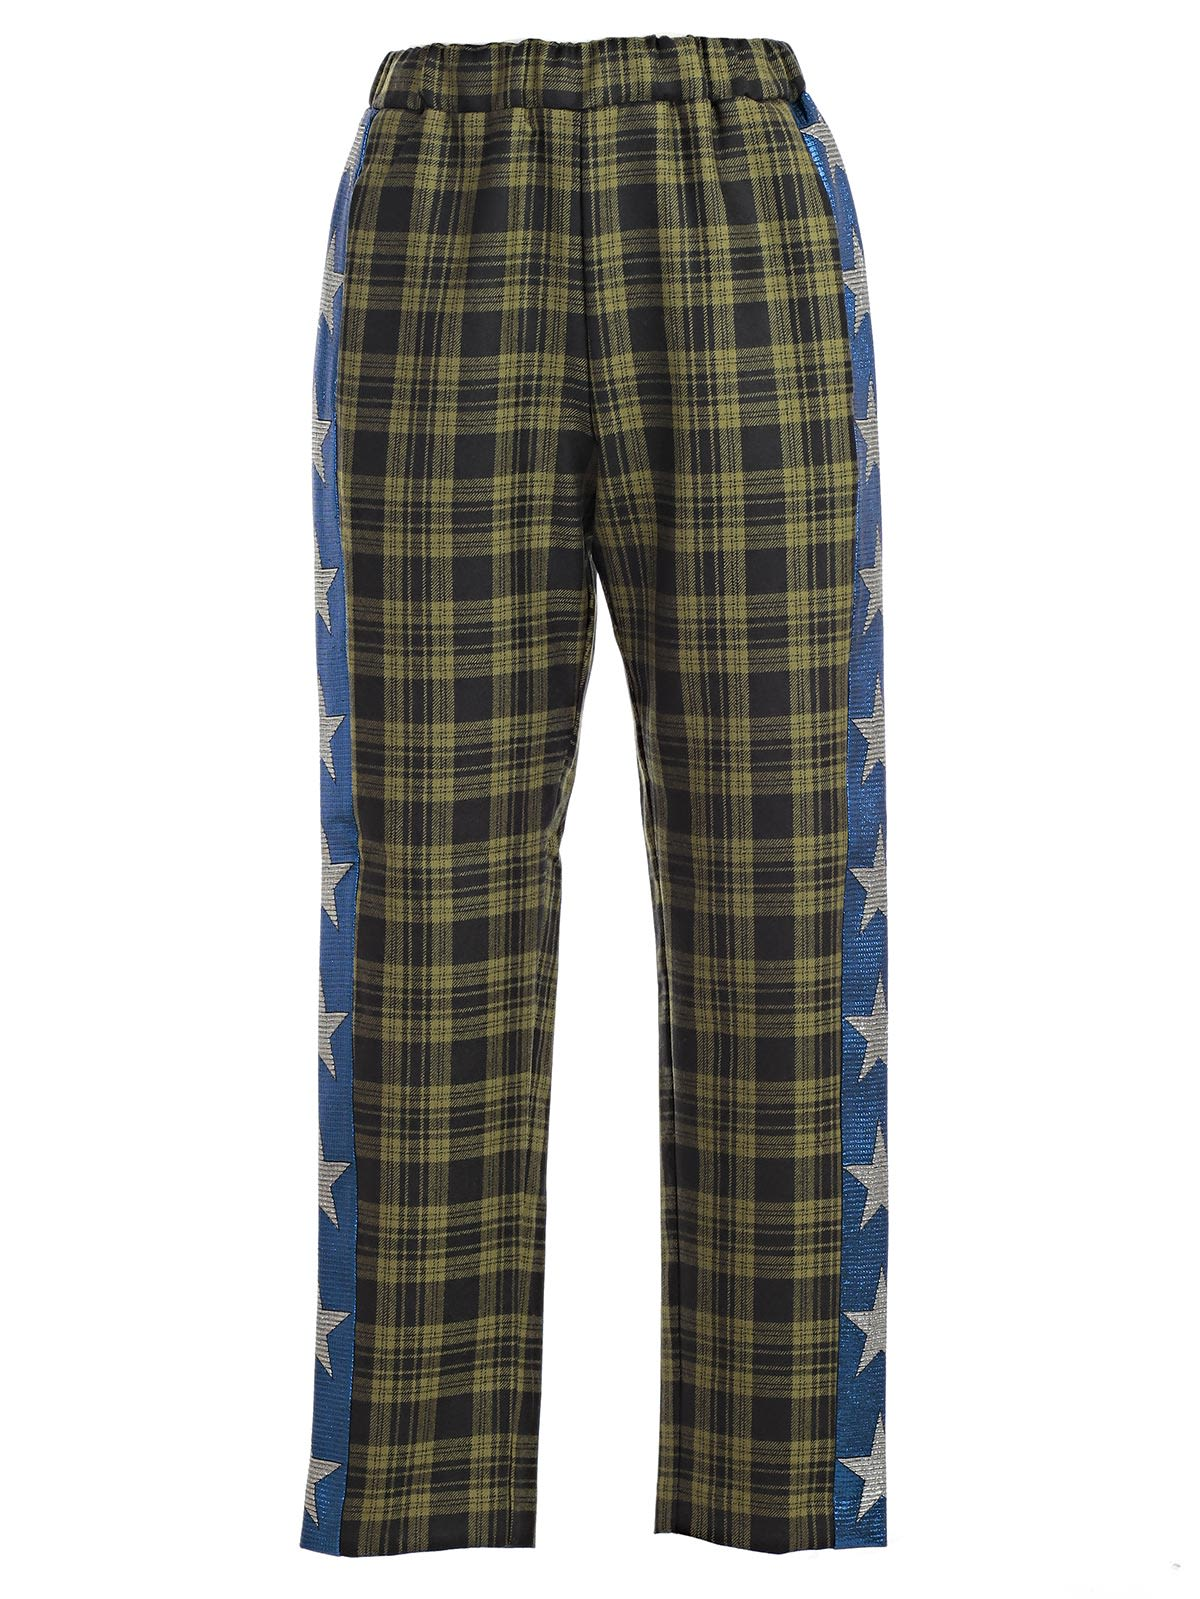 Ultrachic Star Stripe Trousers